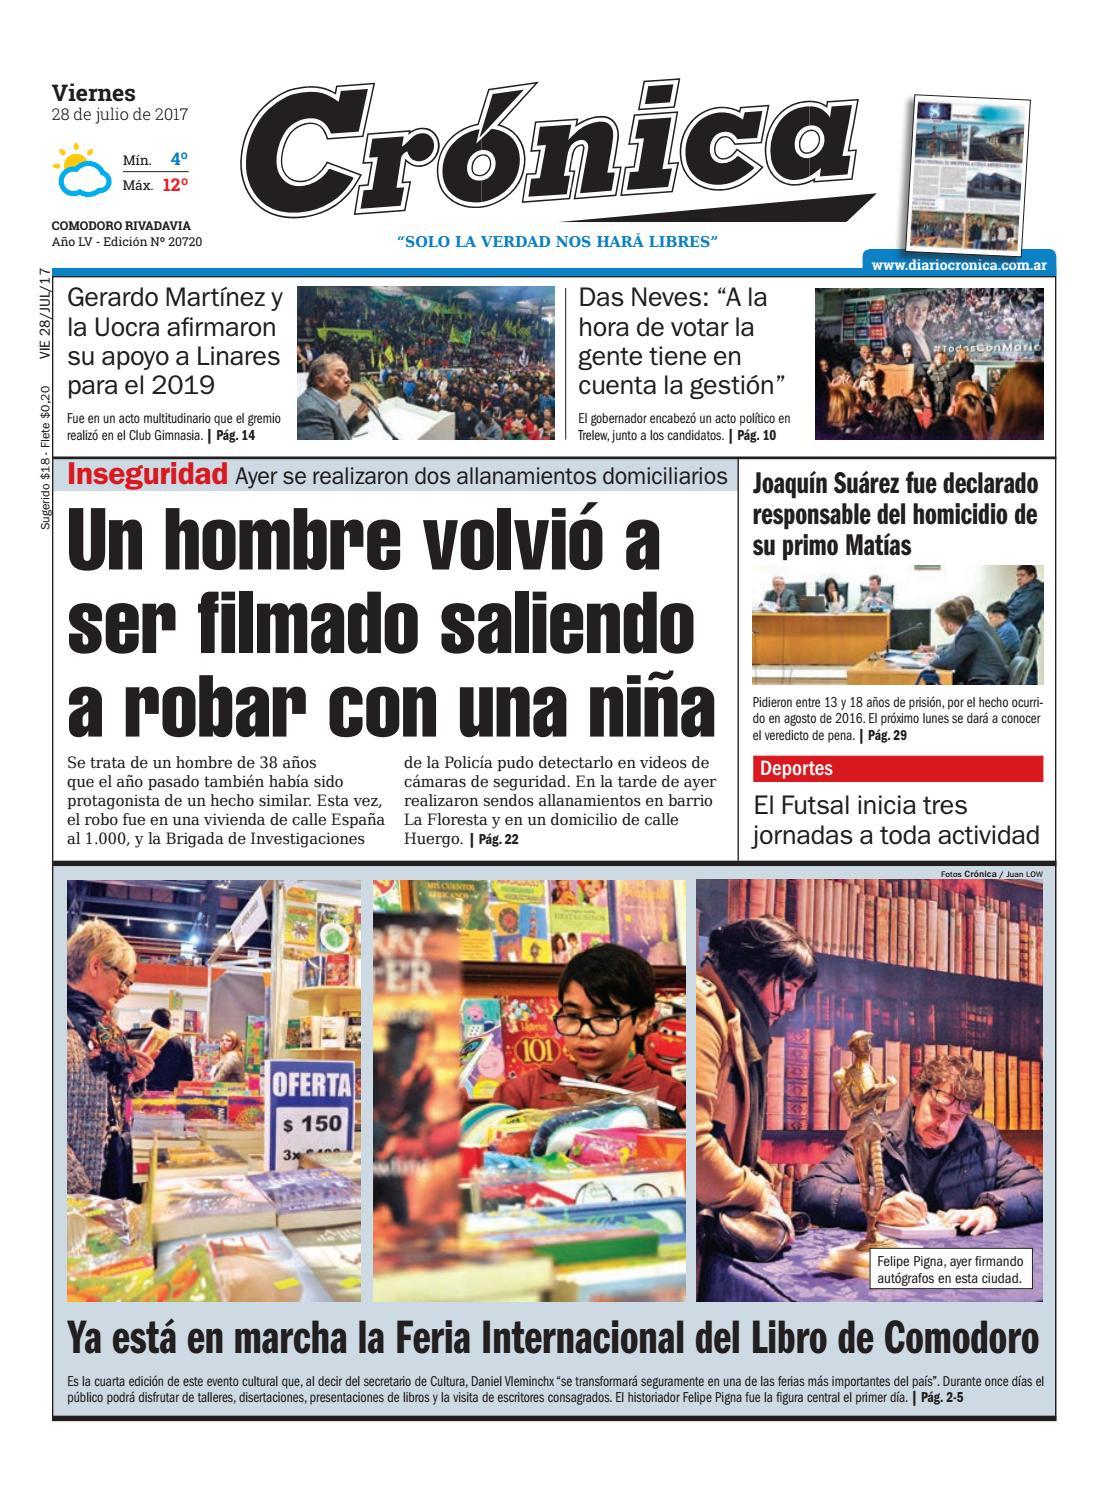 8370d18276702bd48921149e3ce7e540 by Diario Crónica - issuu